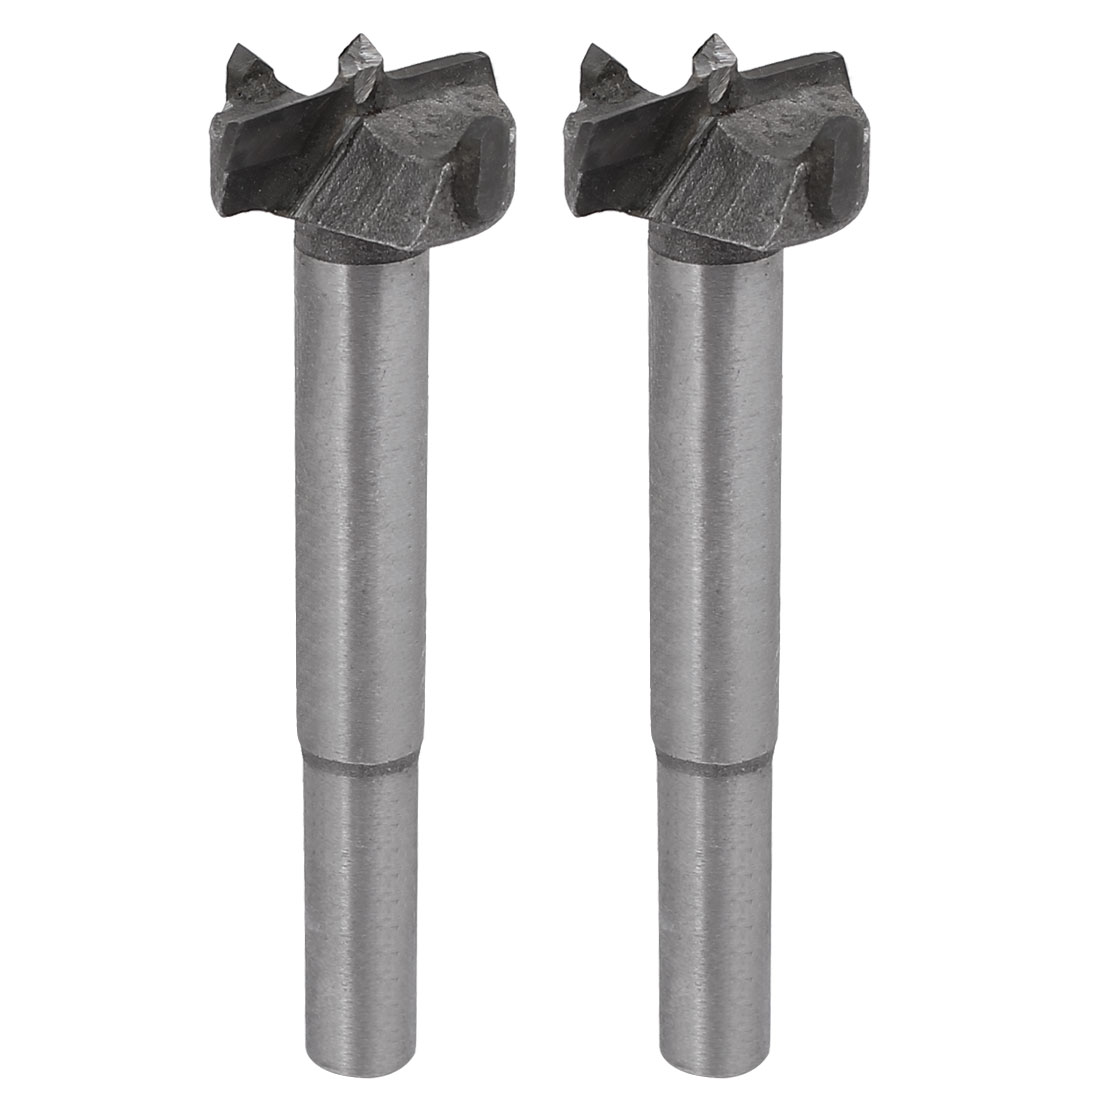 23mm Dia Carbide Tip Round Shank Wood Cutting Hole Saw Hinge Boring Bit 2pcs